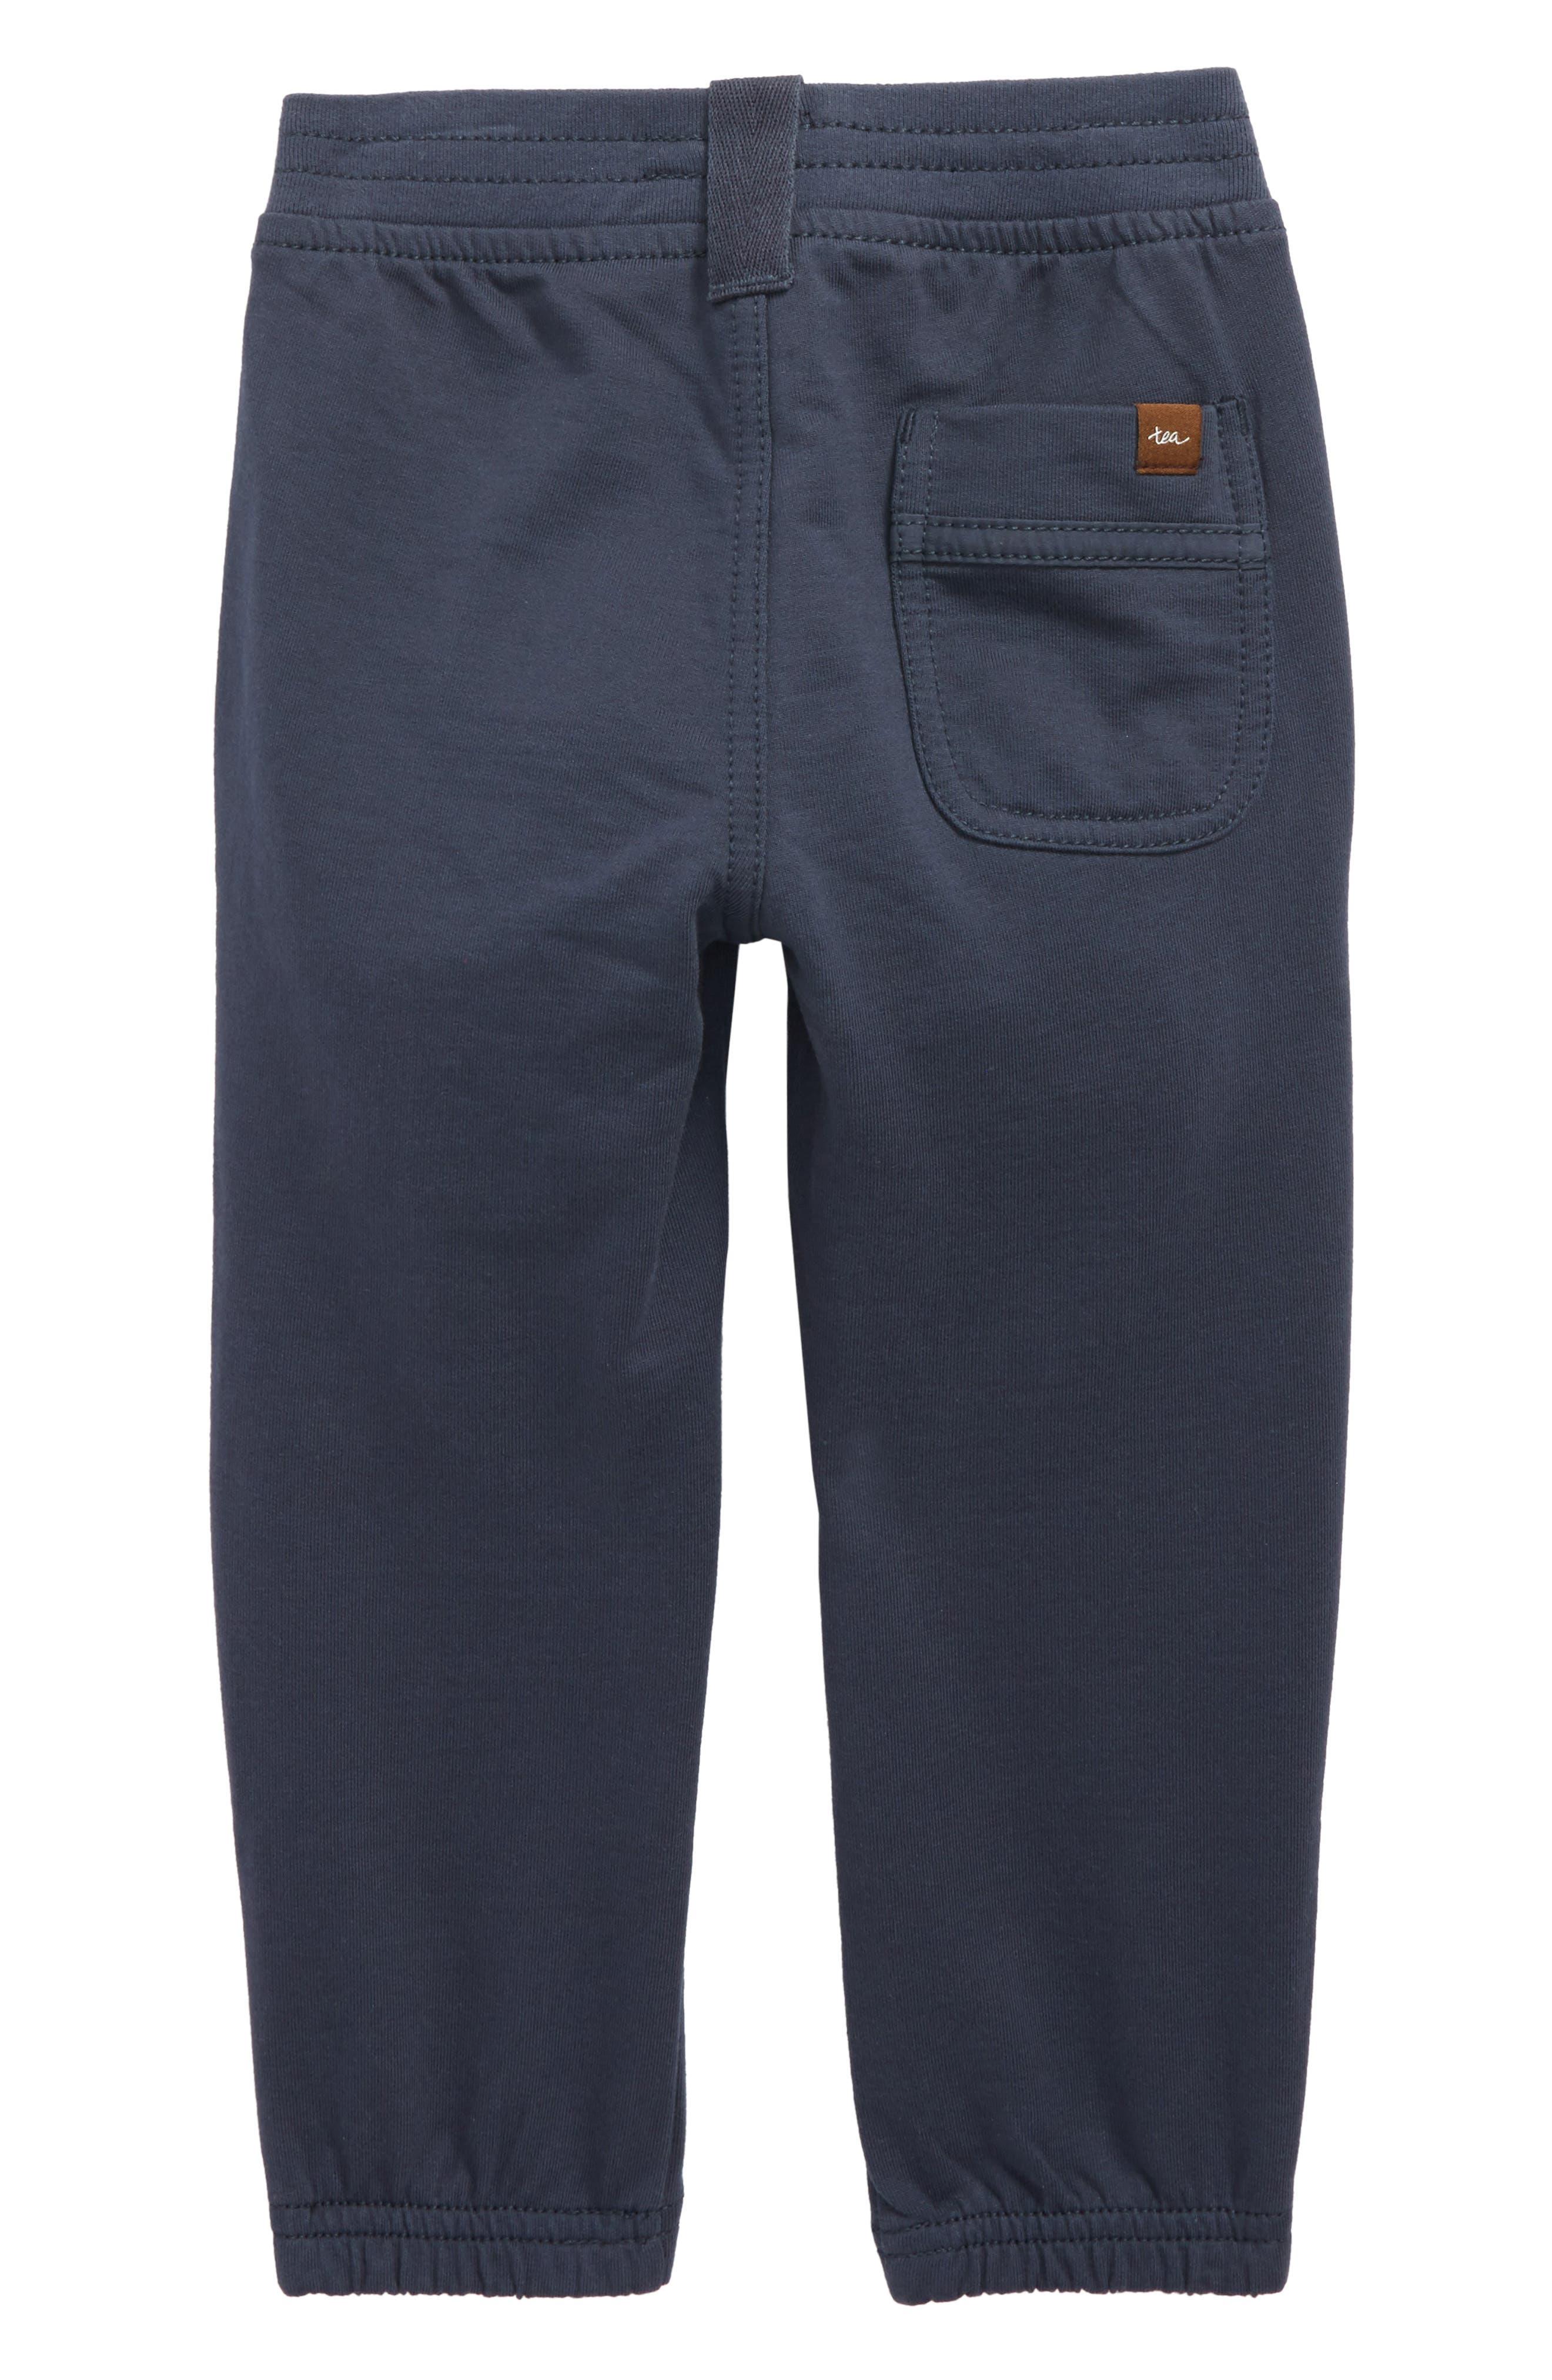 French Terry Moto Pants,                             Alternate thumbnail 2, color,                             Indigo